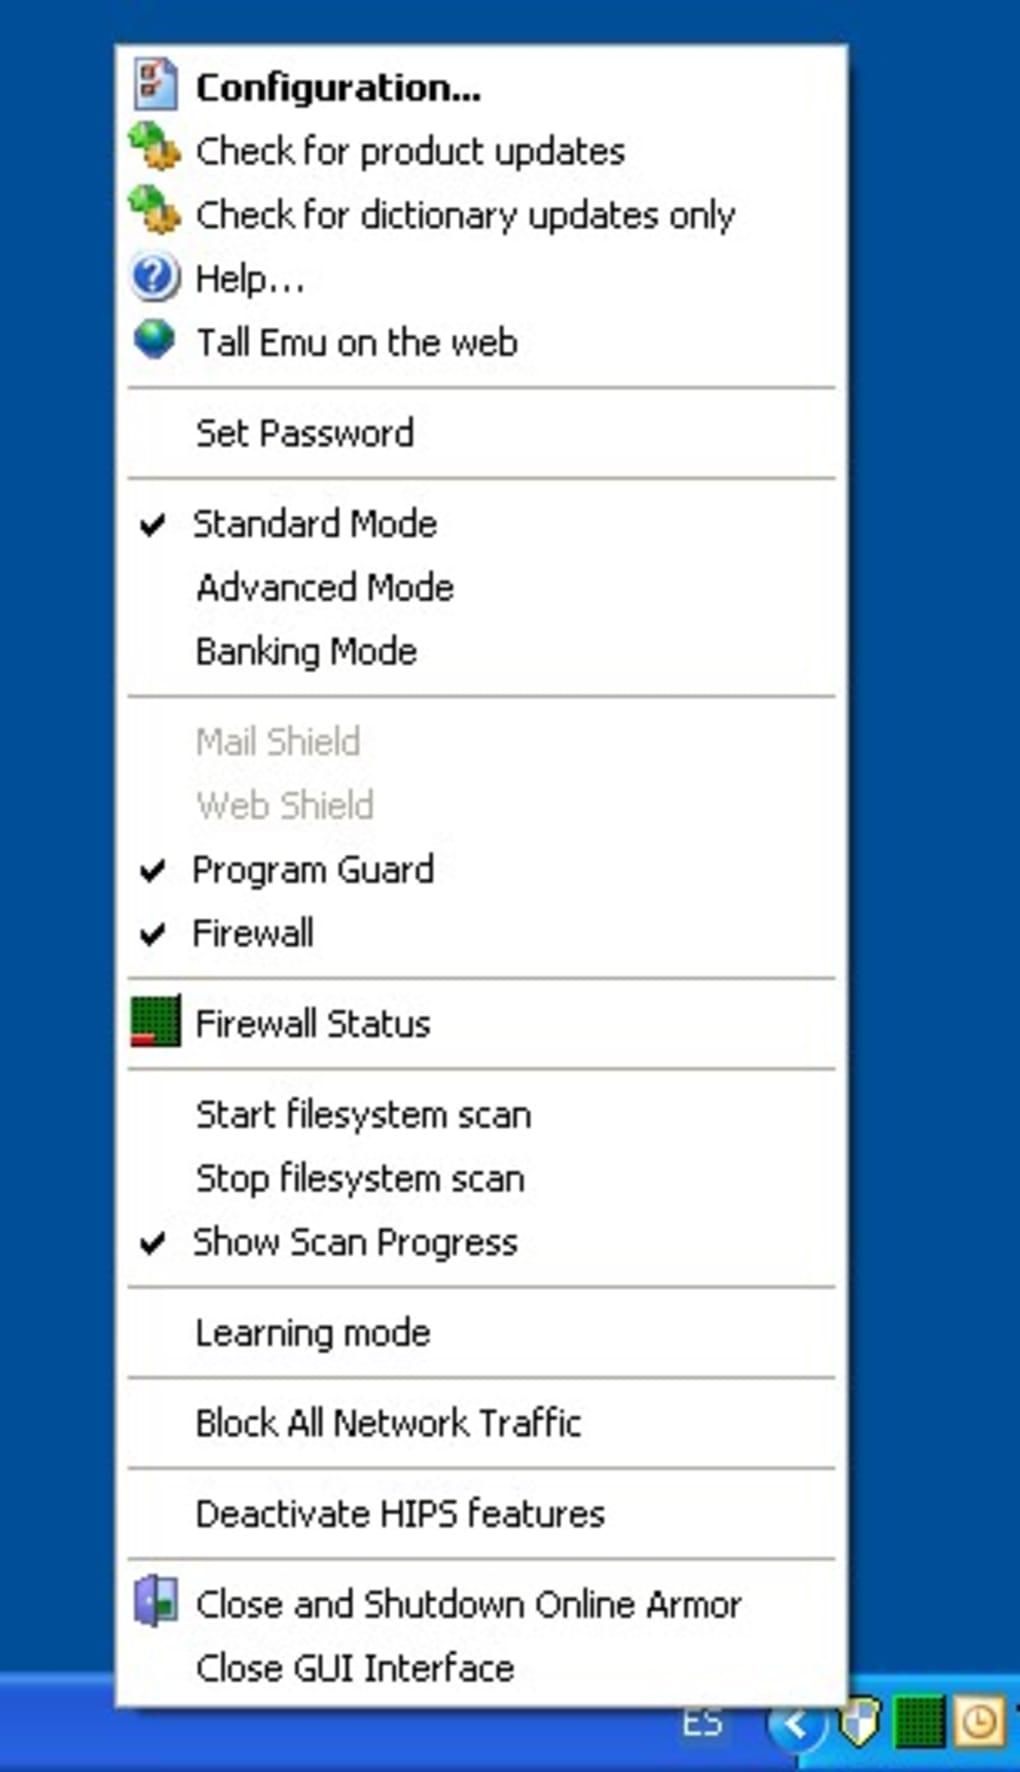 Online armor personal firewall free freeware en download.